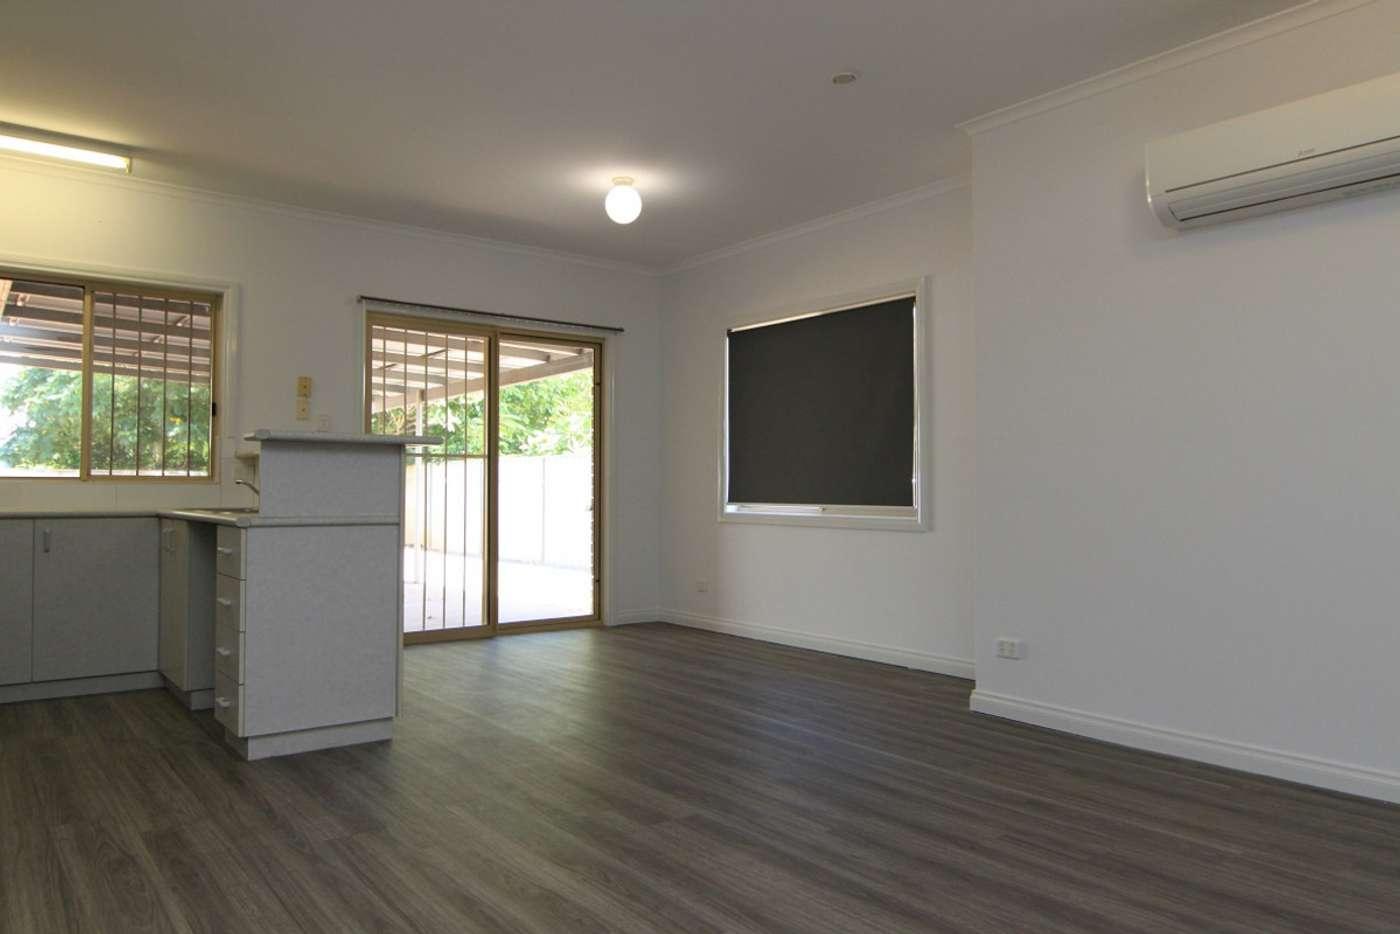 Seventh view of Homely house listing, B/73 Casuarina Way, Kununurra WA 6743